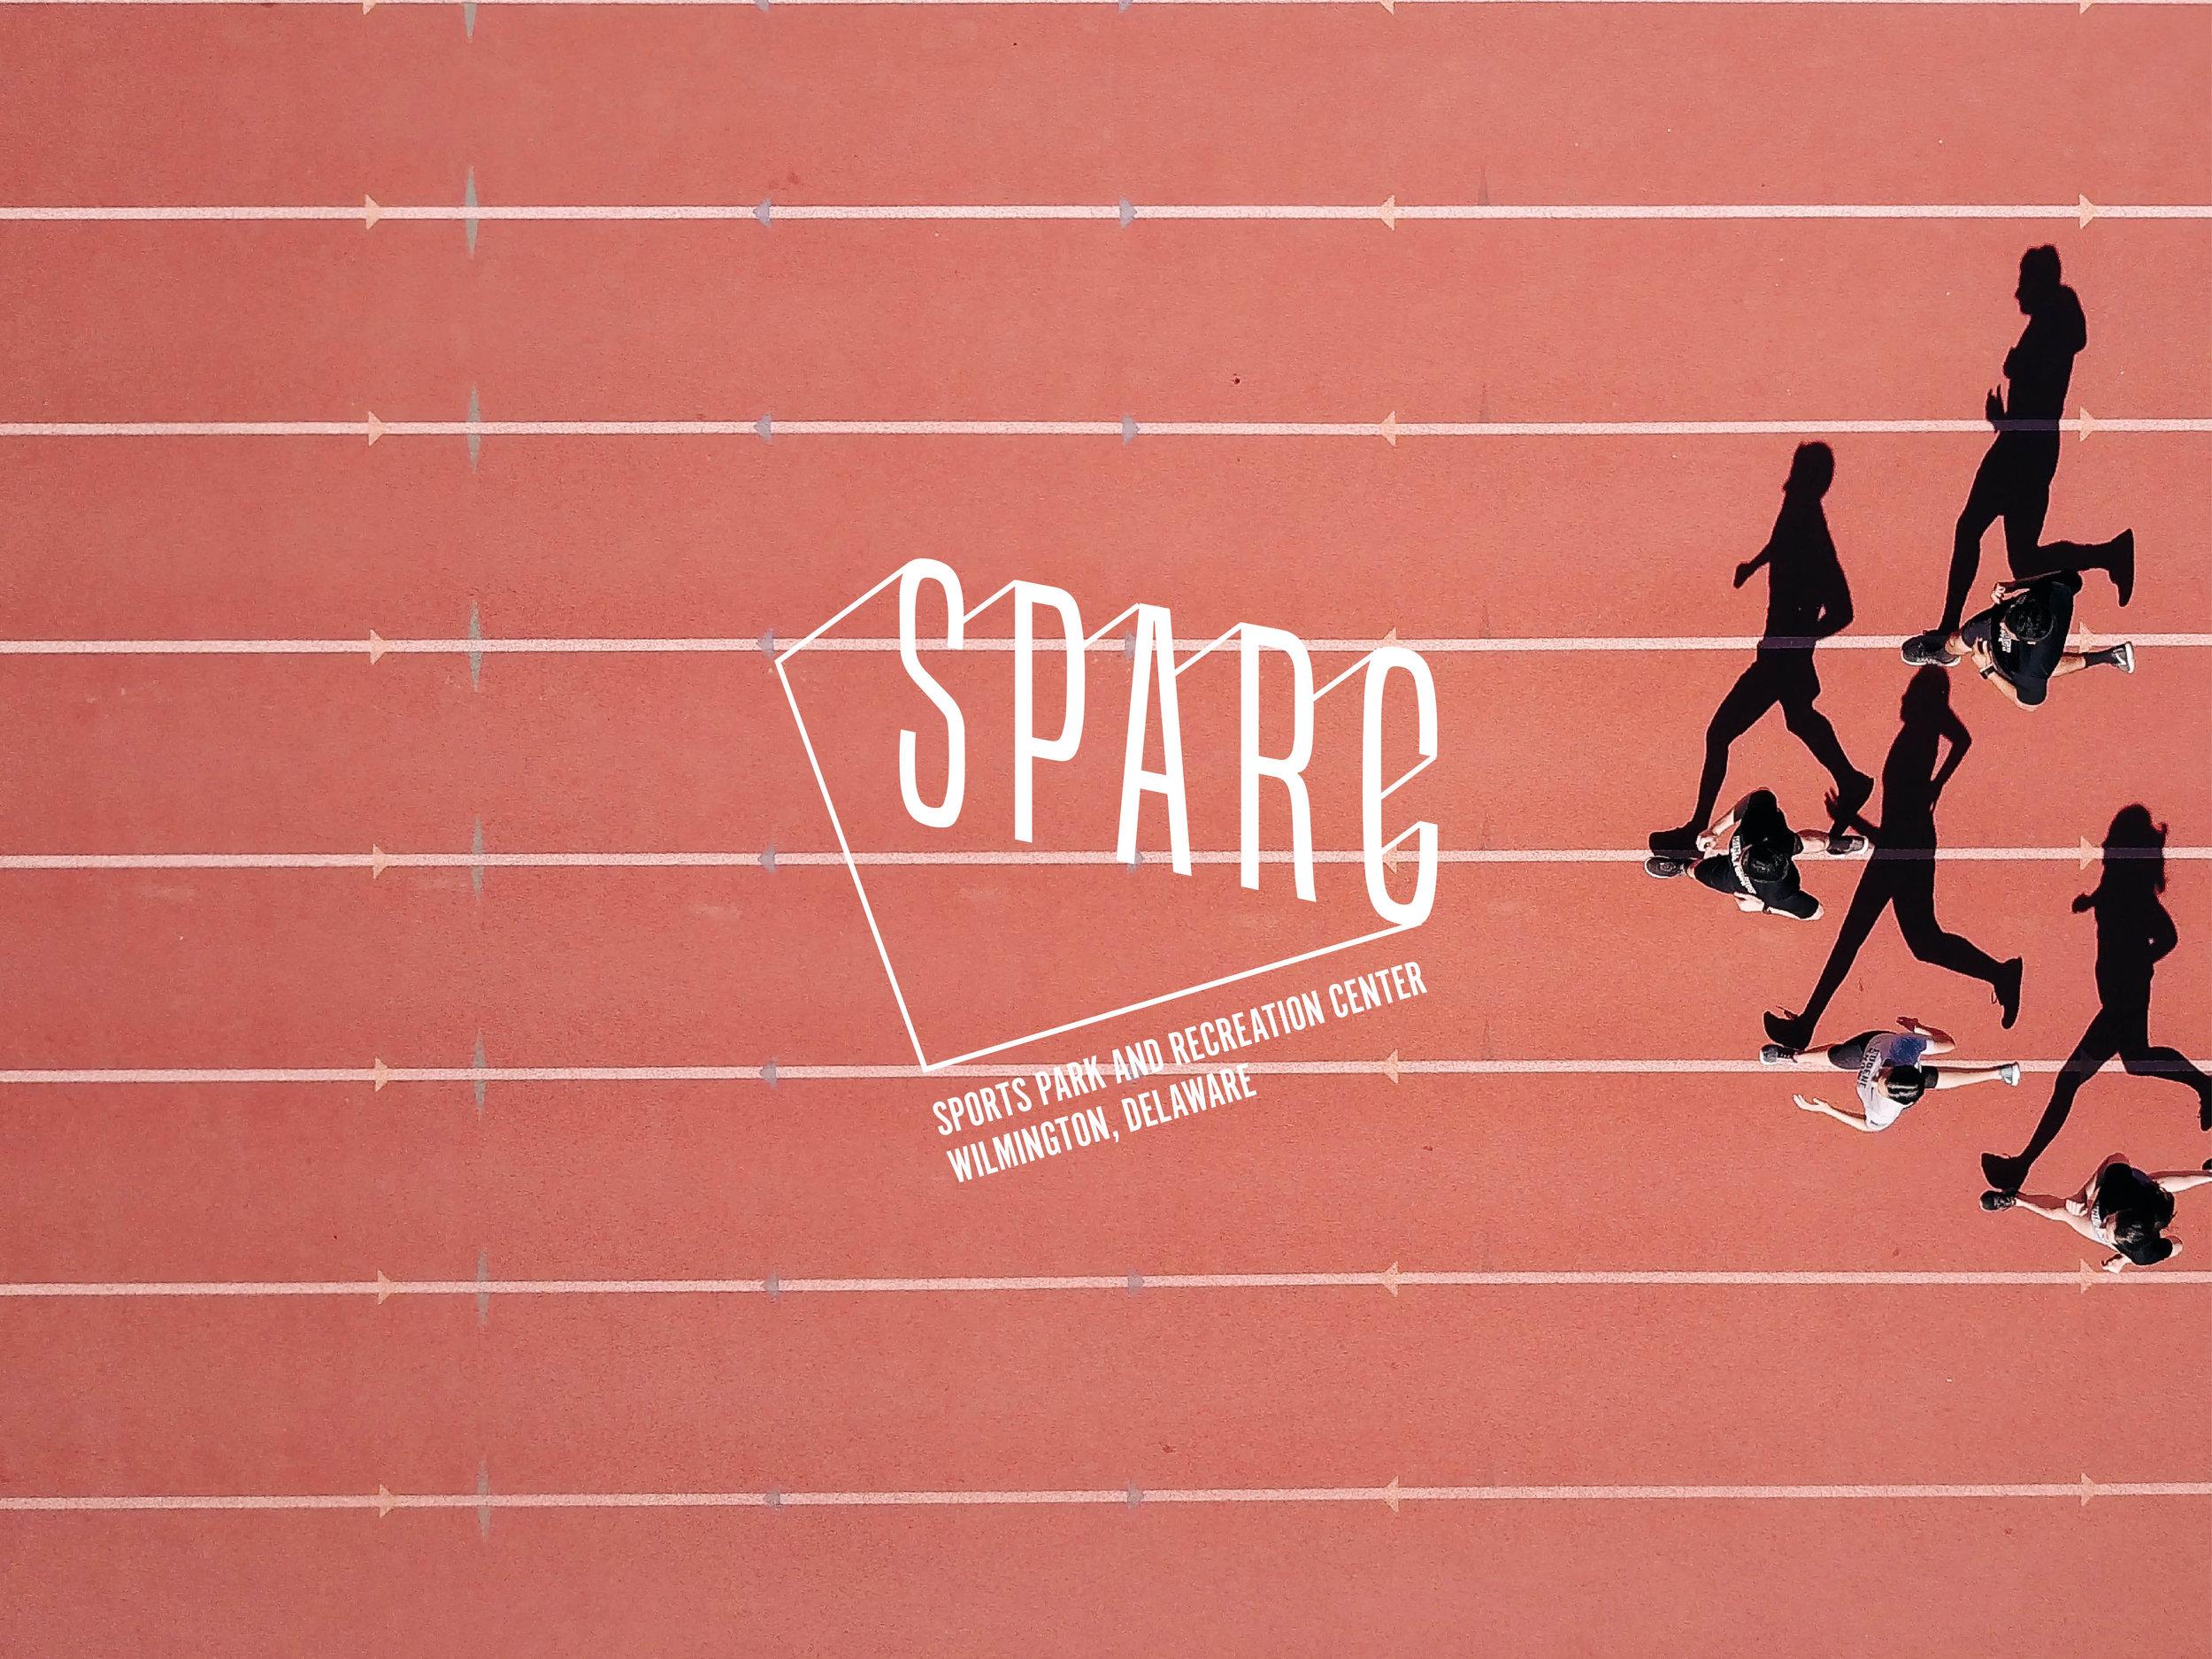 sparc brand images3.jpg